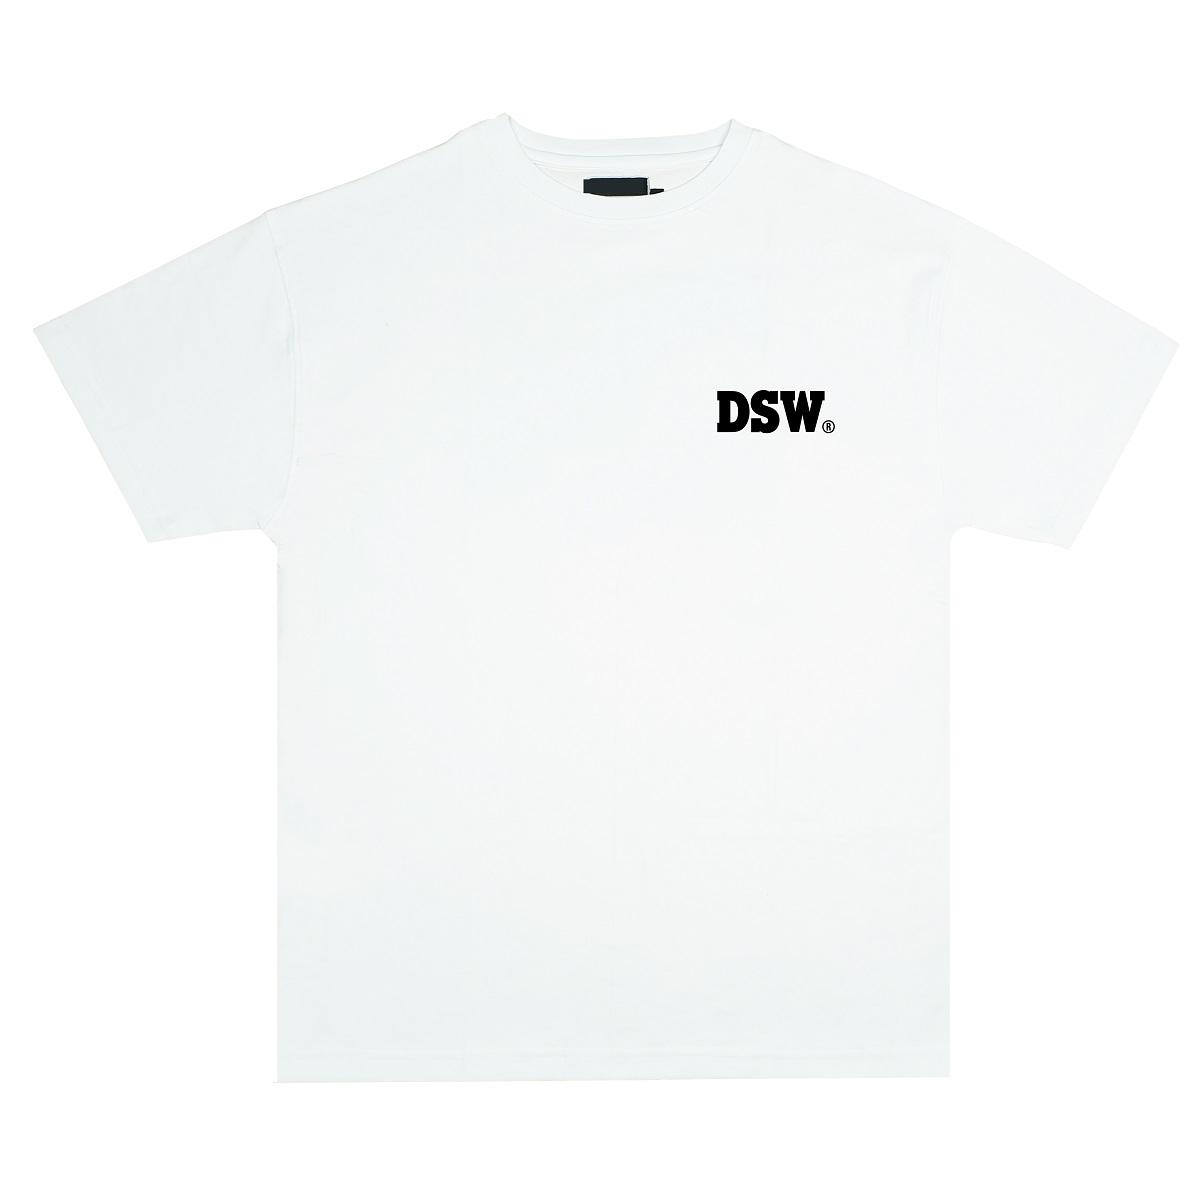 DSW TEE BASIC LOGO - WHITE